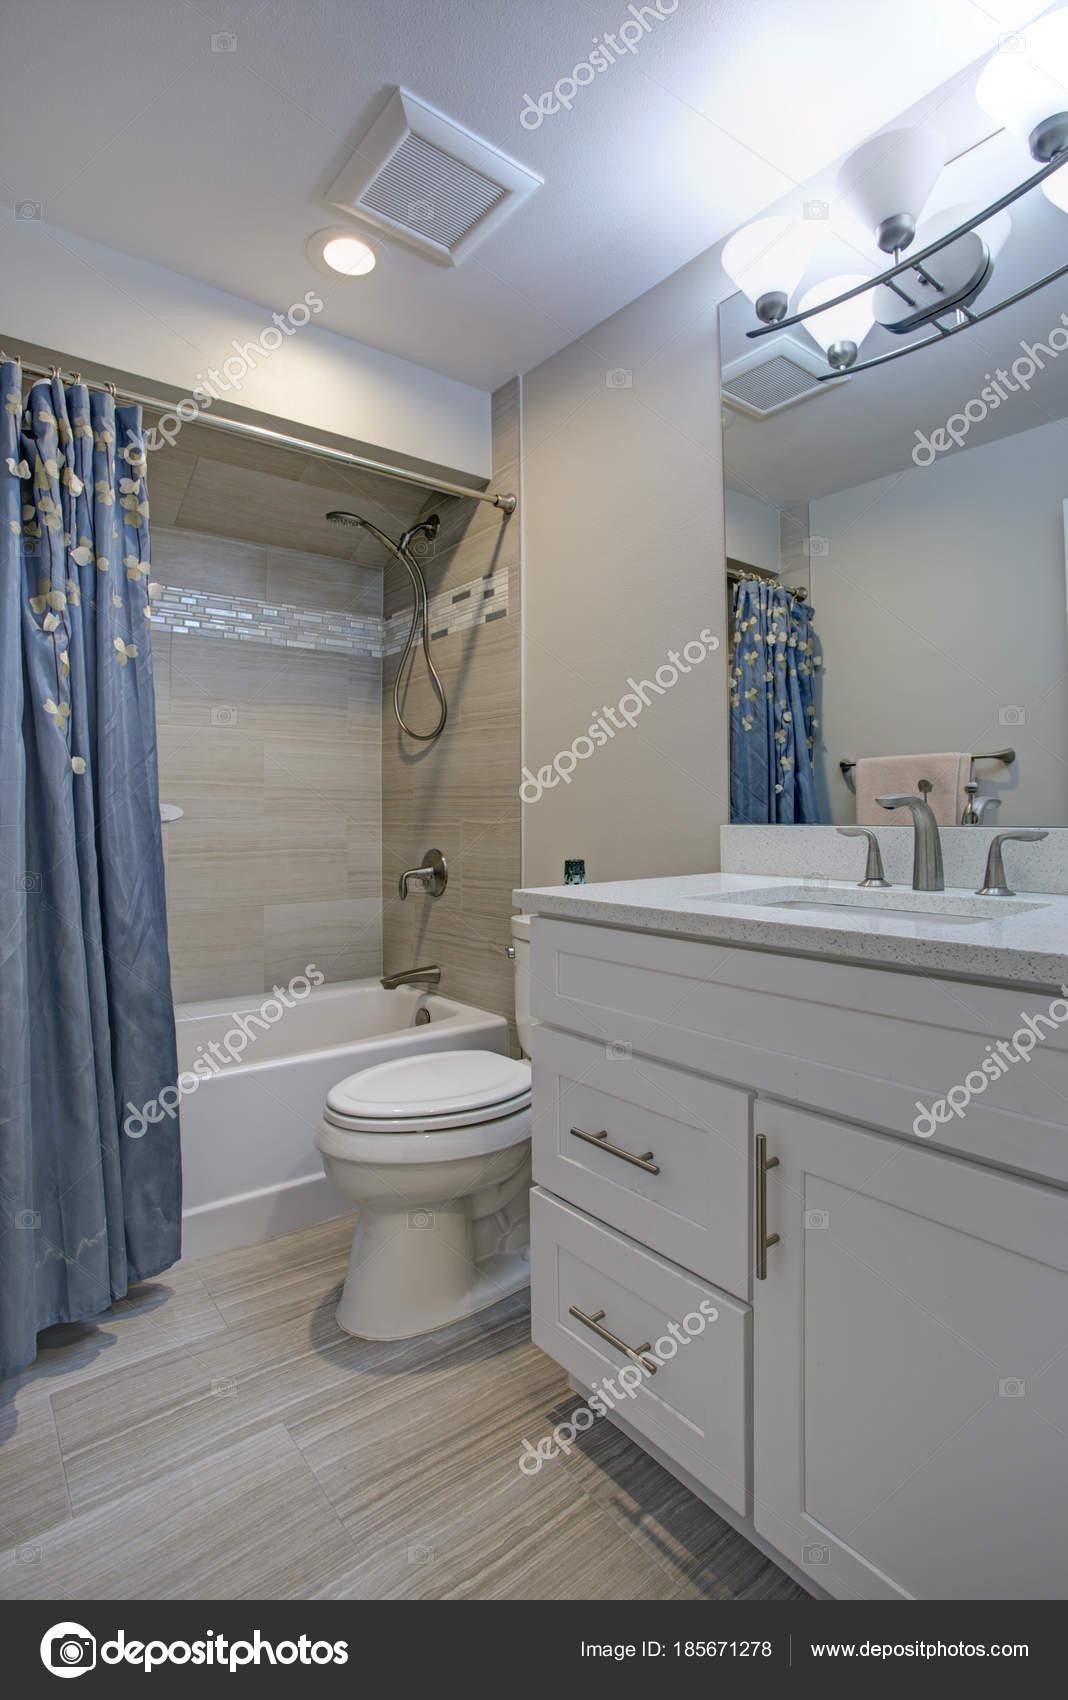 White Grey Marble Bathroom Elegant Bathroom With Marble Bathroom Floor Stock Photo C Alabn 185671278